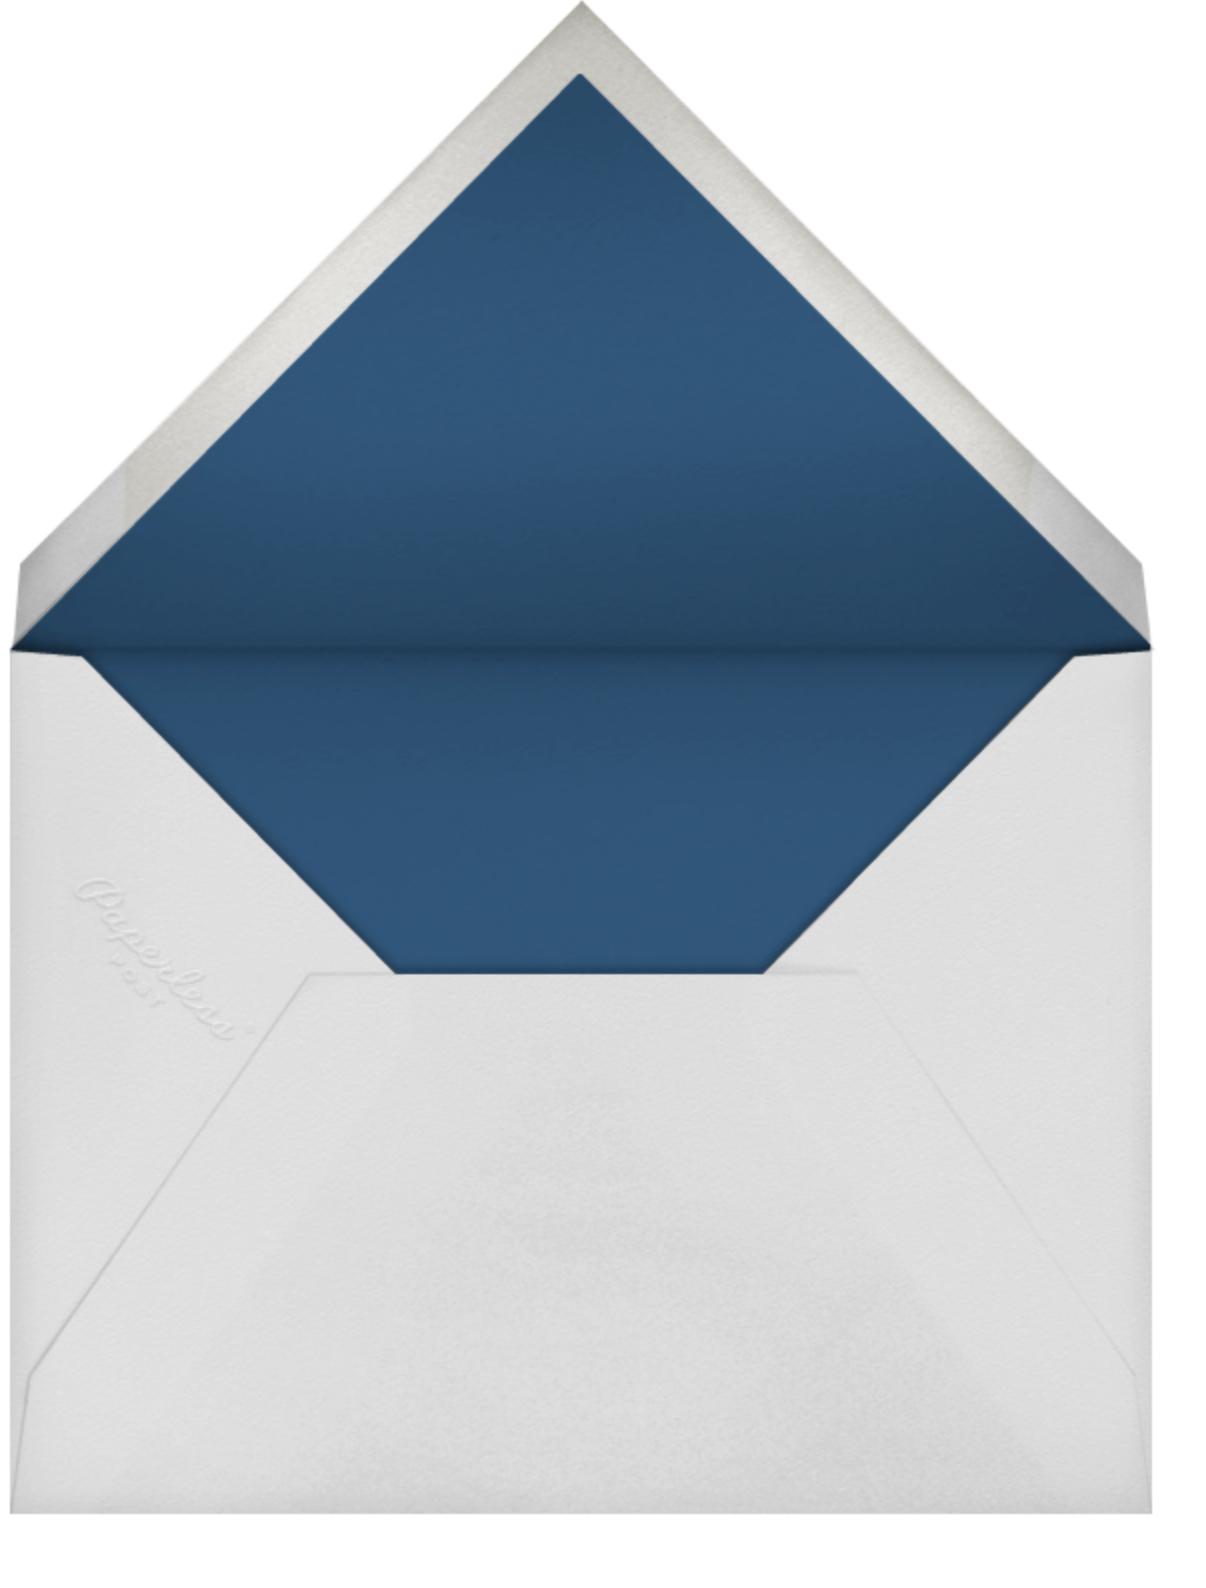 Belle Boulevard (Invitation) - Silver - kate spade new york - All - envelope back